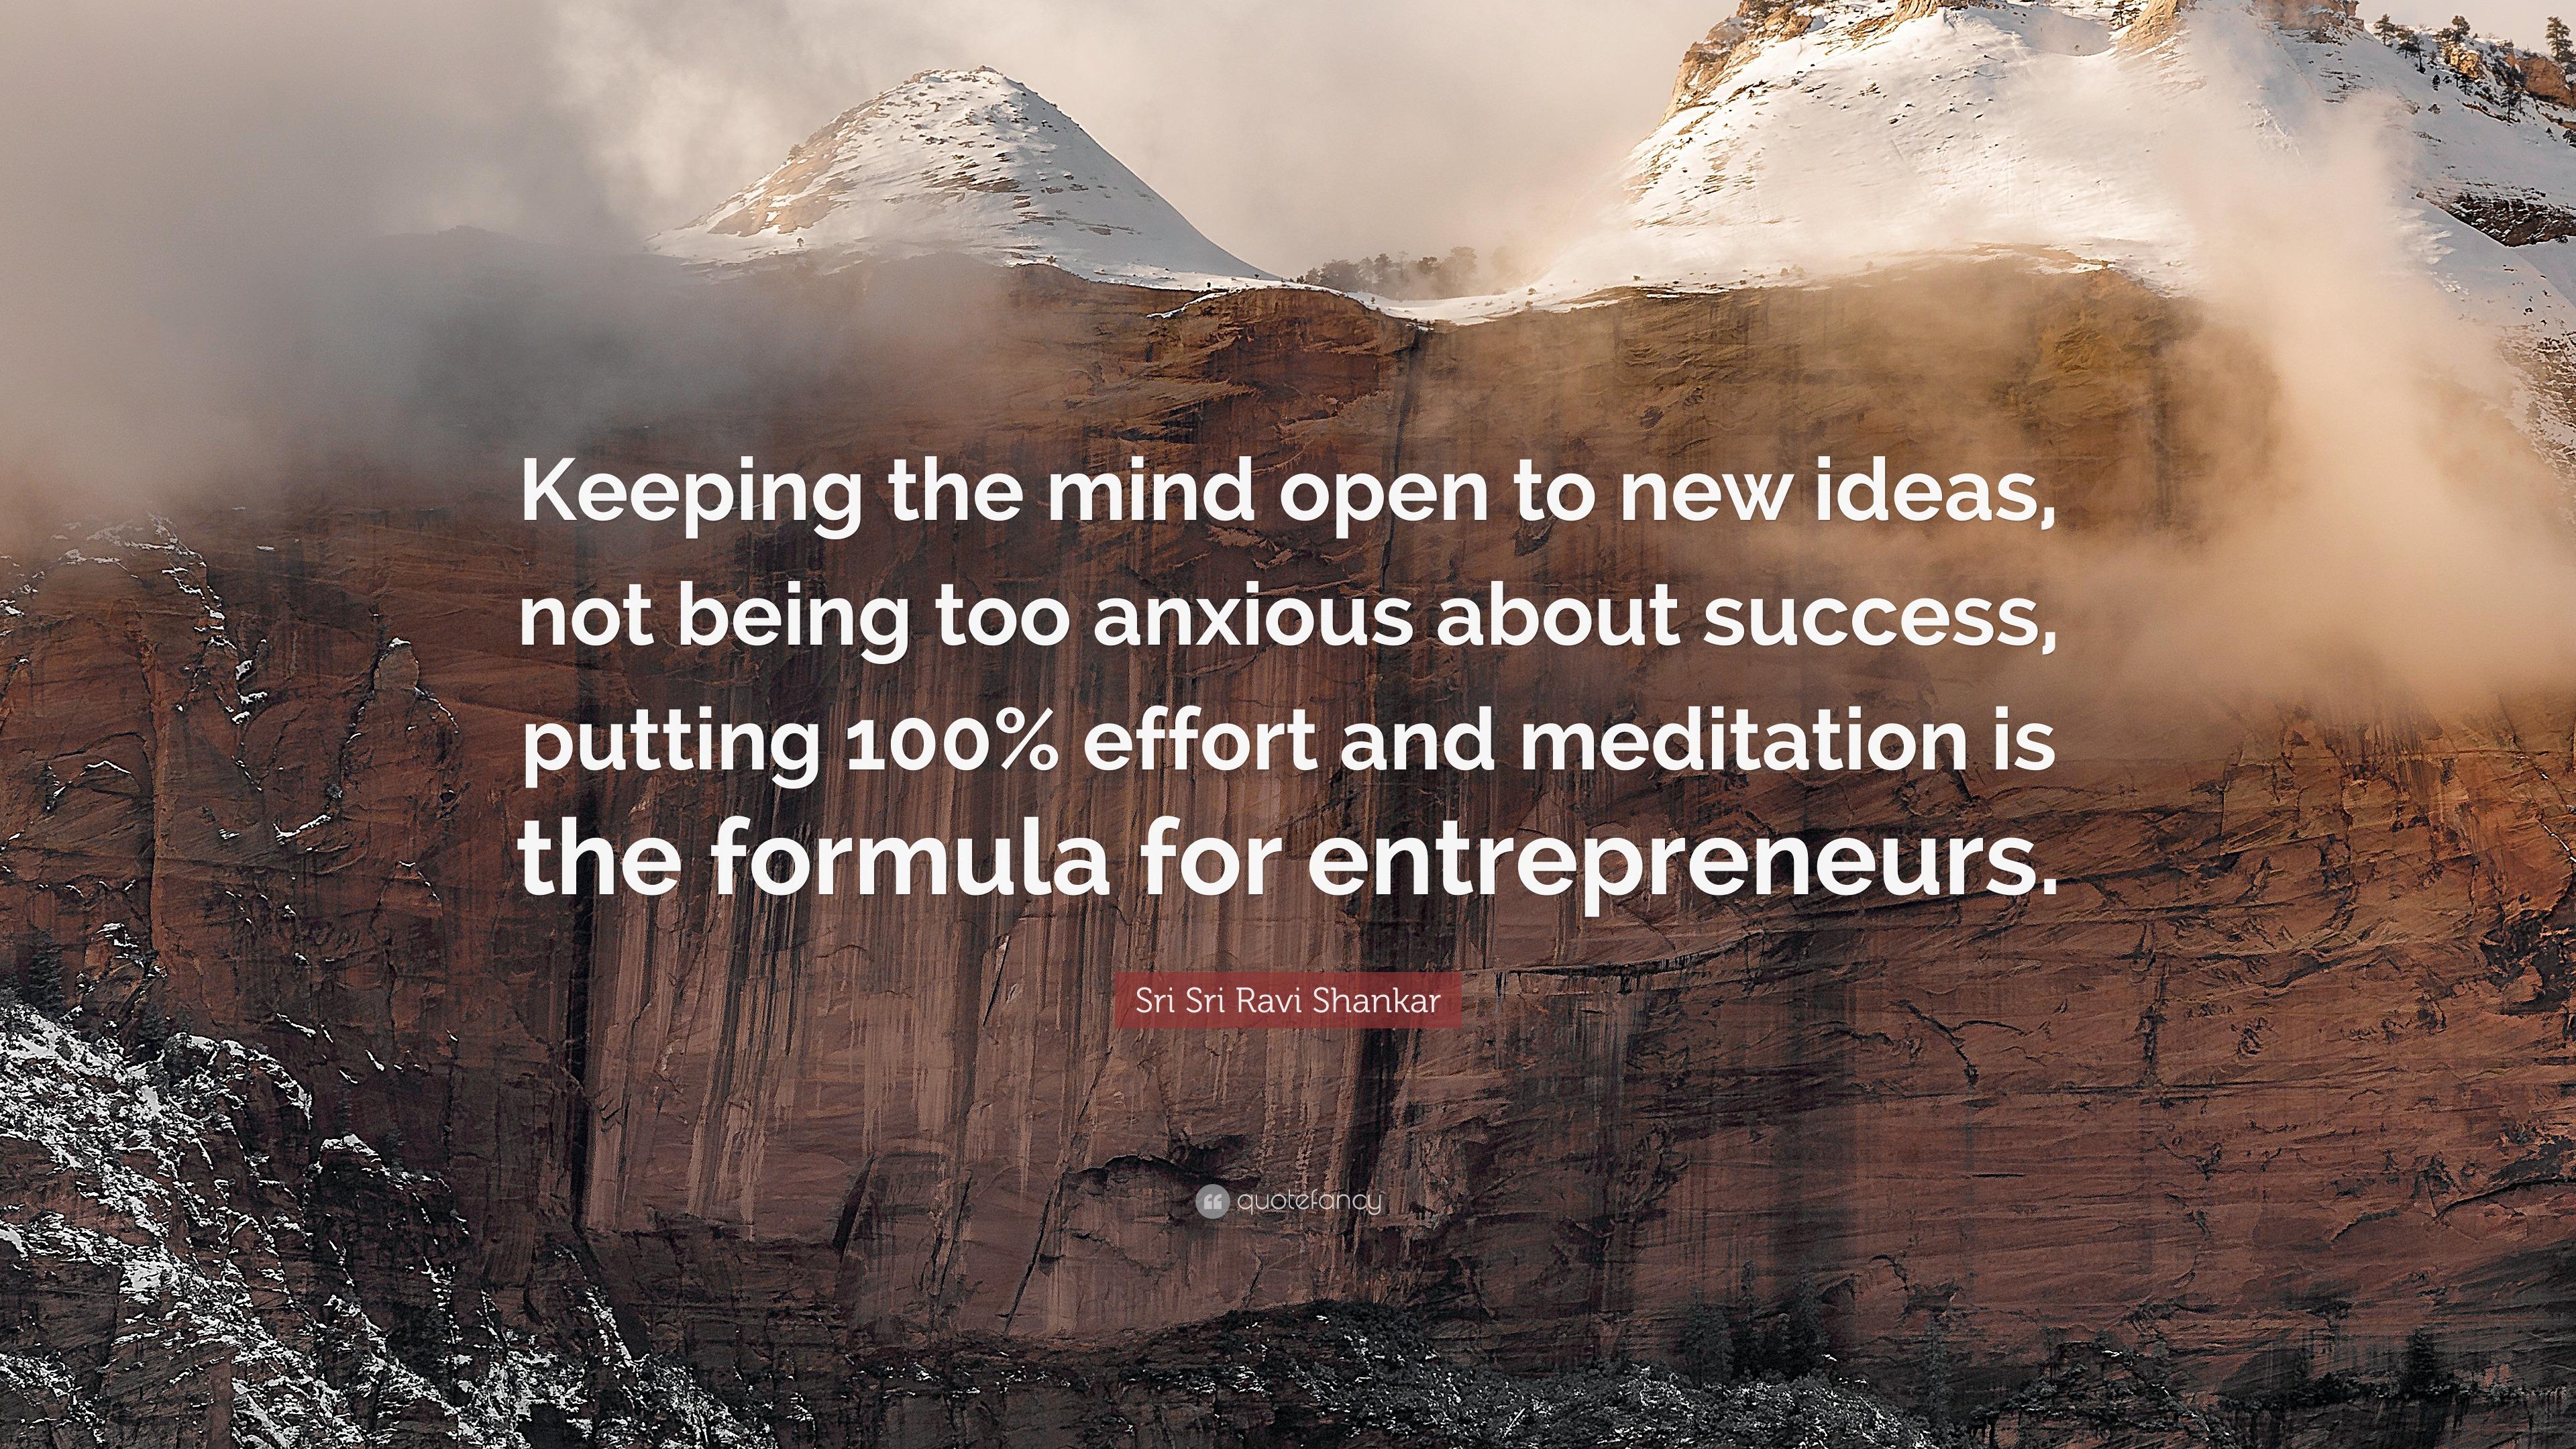 Sri Sri Ravi Shankar Quote Keeping The Mind Open To New Ideas Not